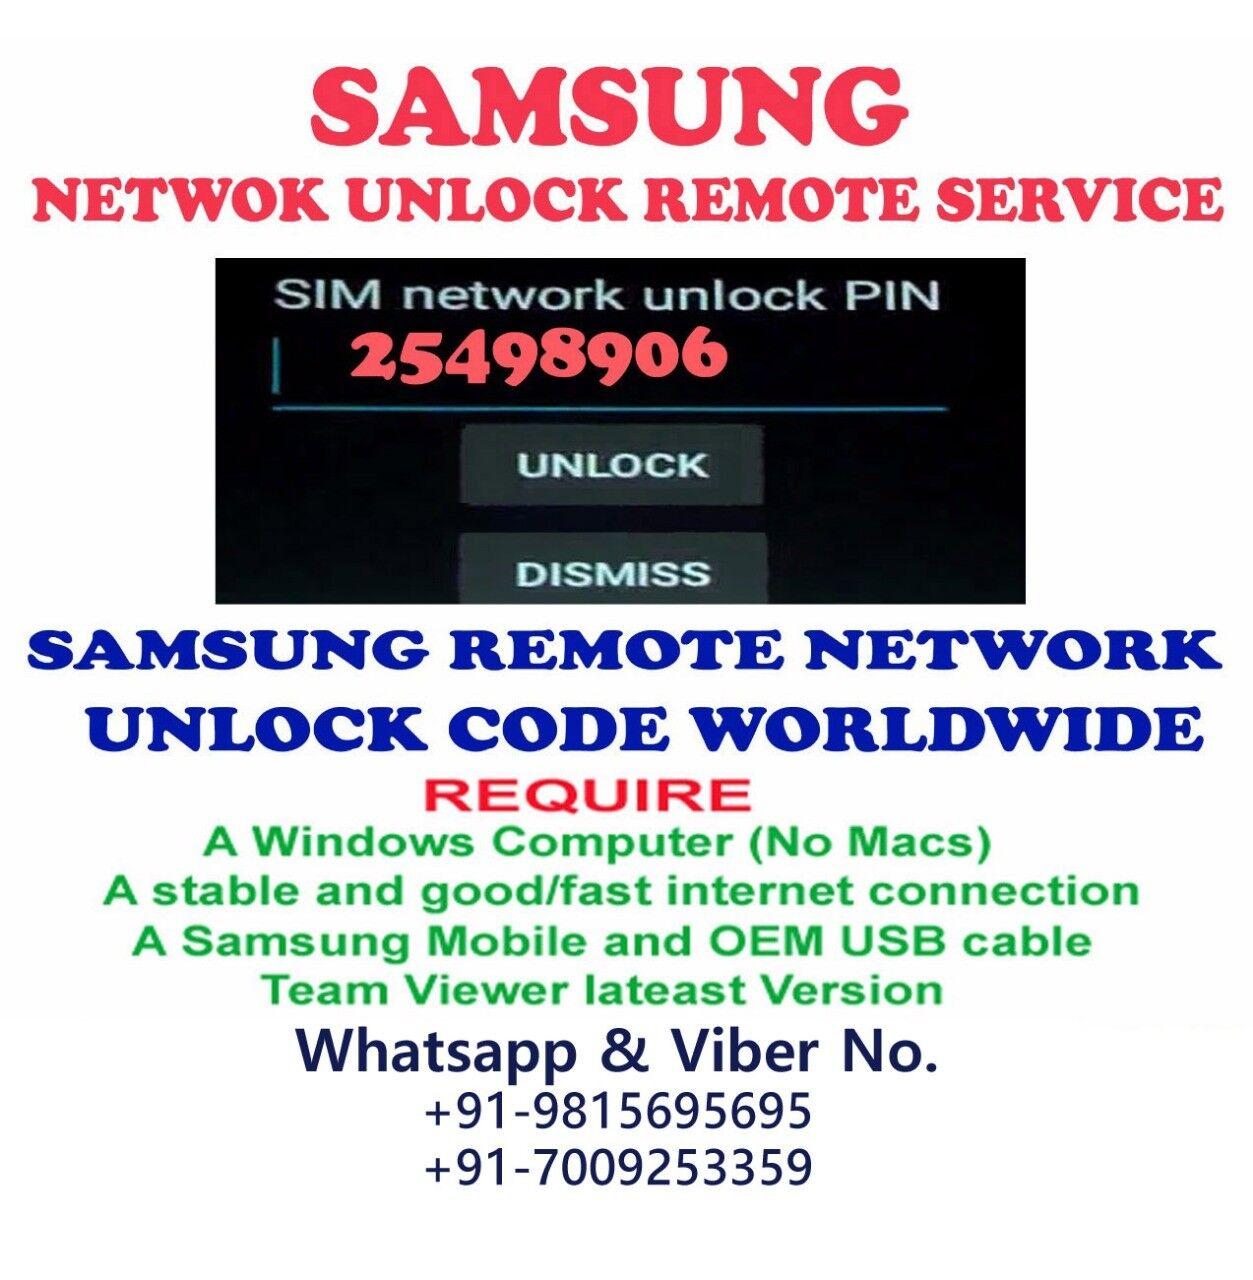 SAMSUNG REMOTE UNLOCK CODE PREMIUM SERVICE Samsung Galaxy J7 Prime SM-G610I